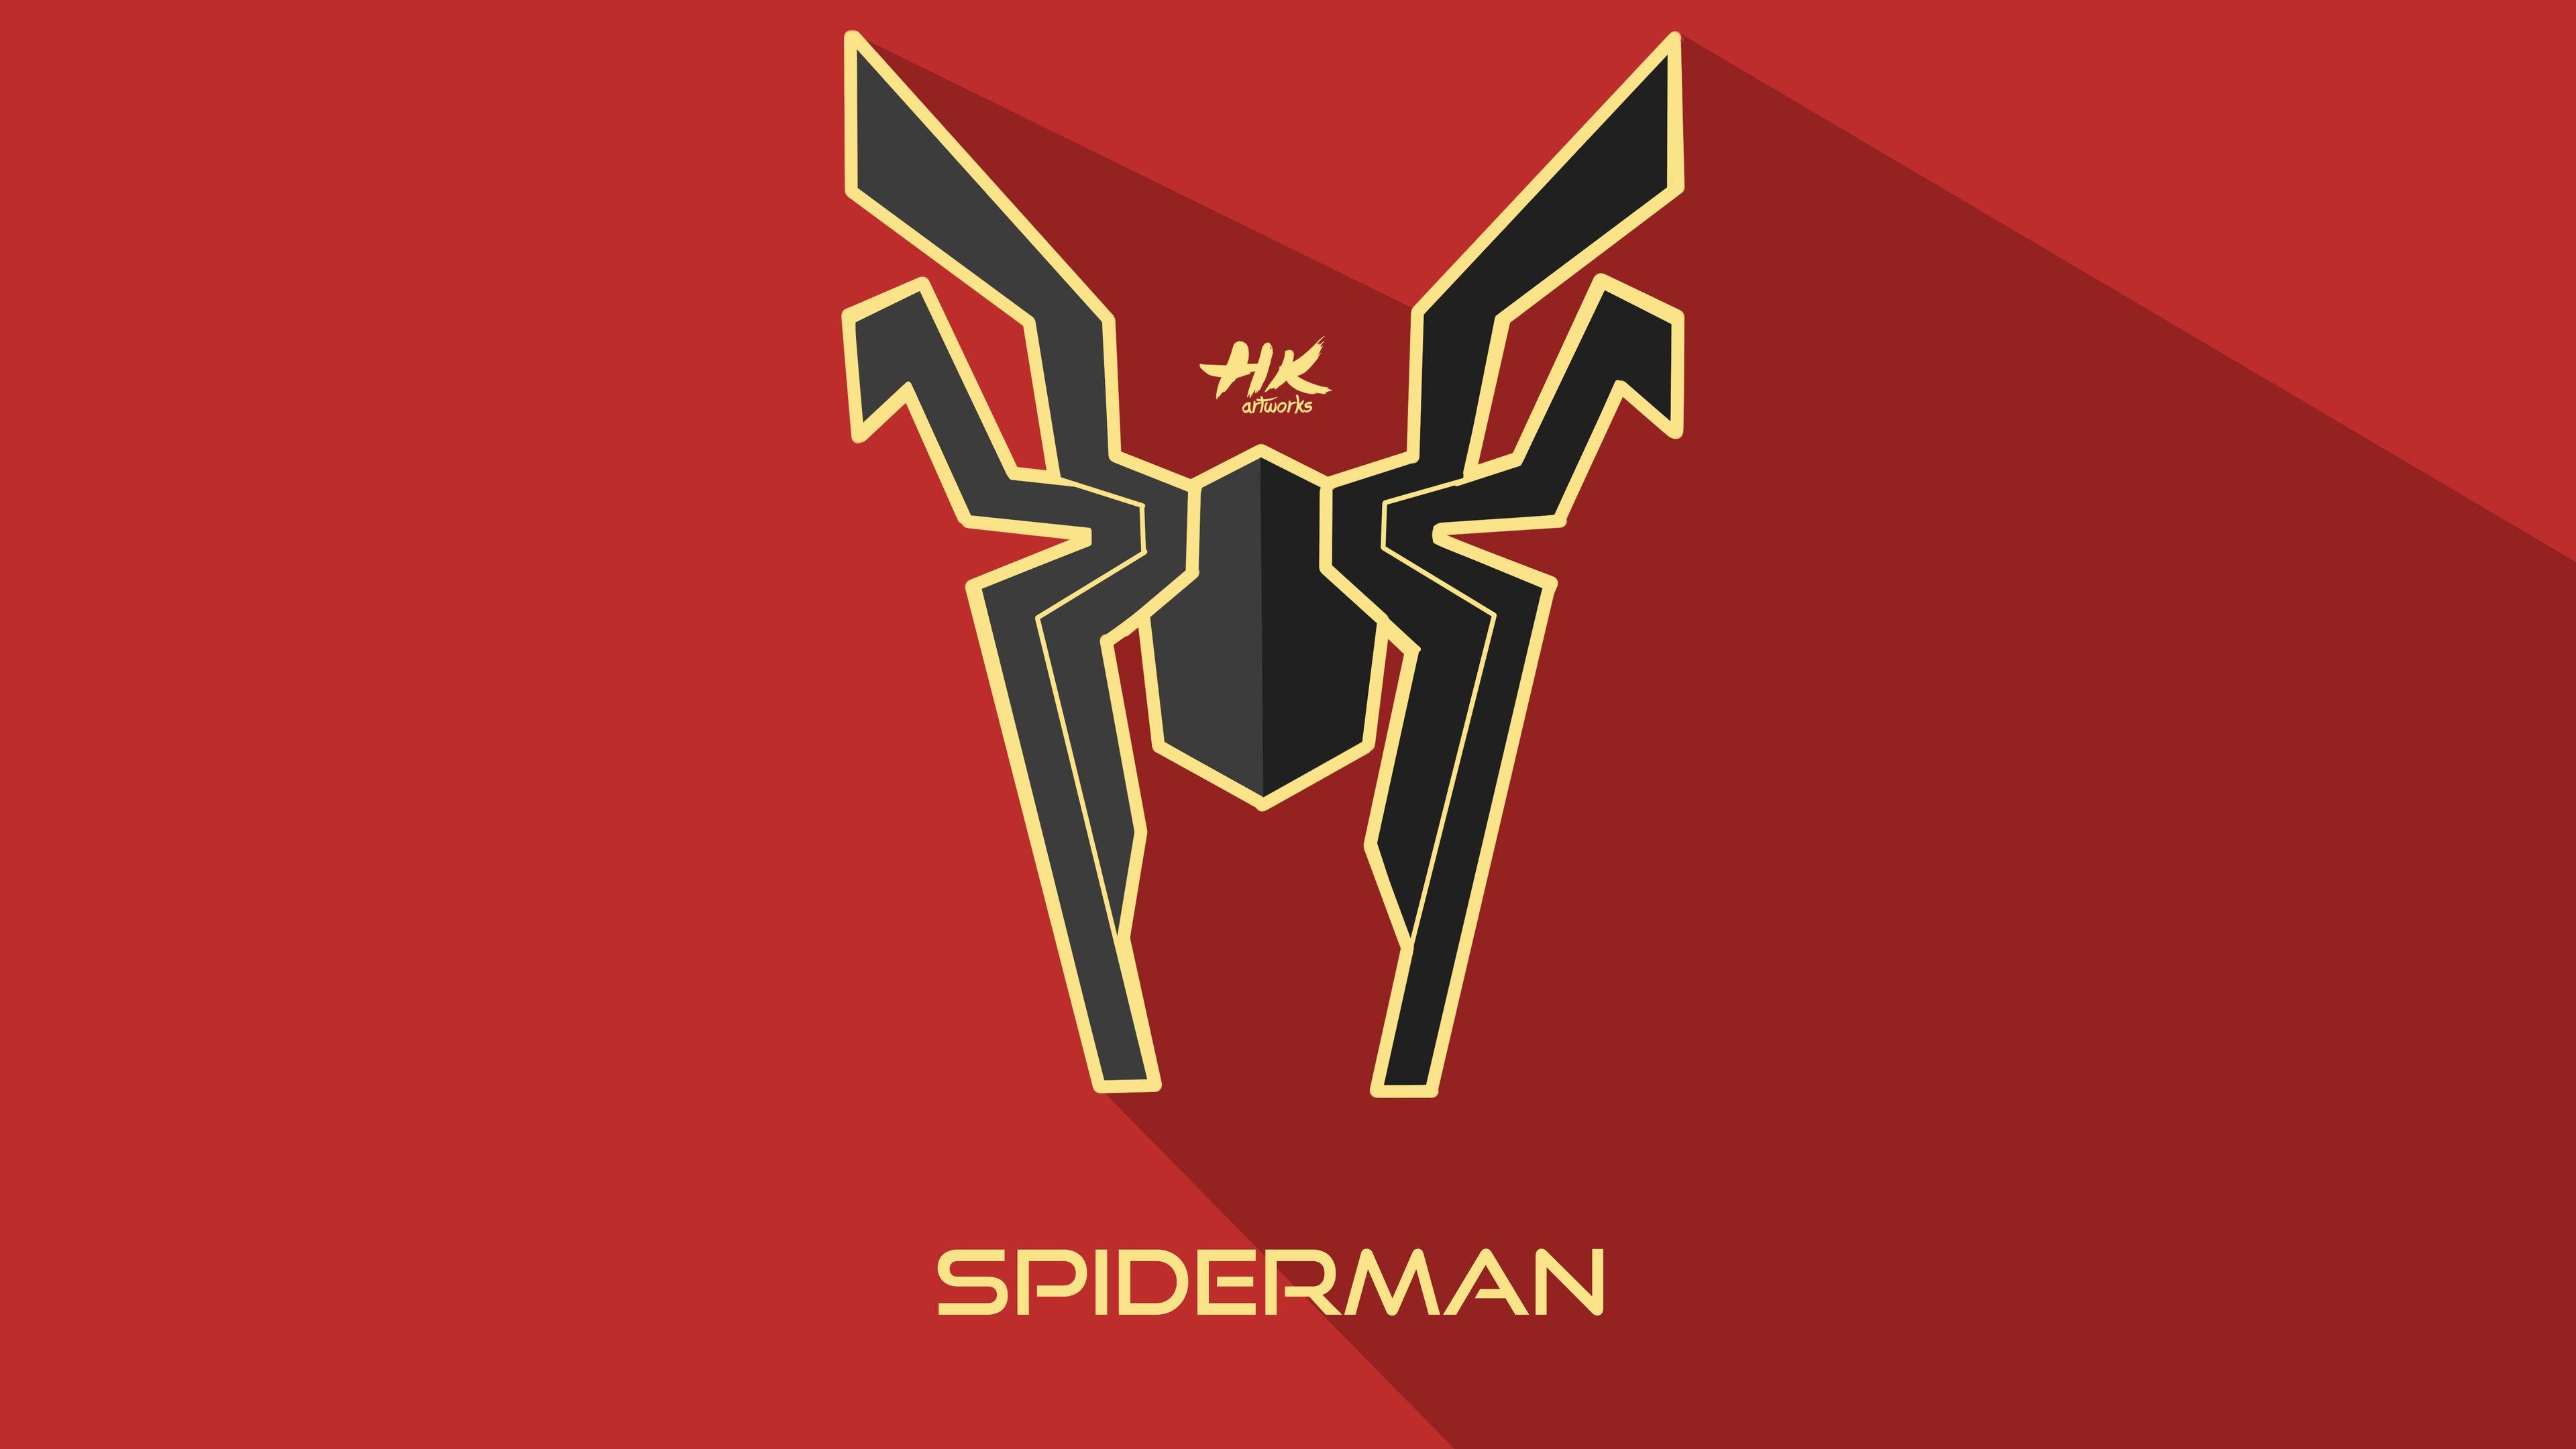 Iron Spider Infinity War Logo Superheroes Wallpapers Spiderman Wallpapers Logo Wallpapers Hd Wallpapers Deviantart In 2020 Iron Spider Spiderman Iron Man Wallpaper